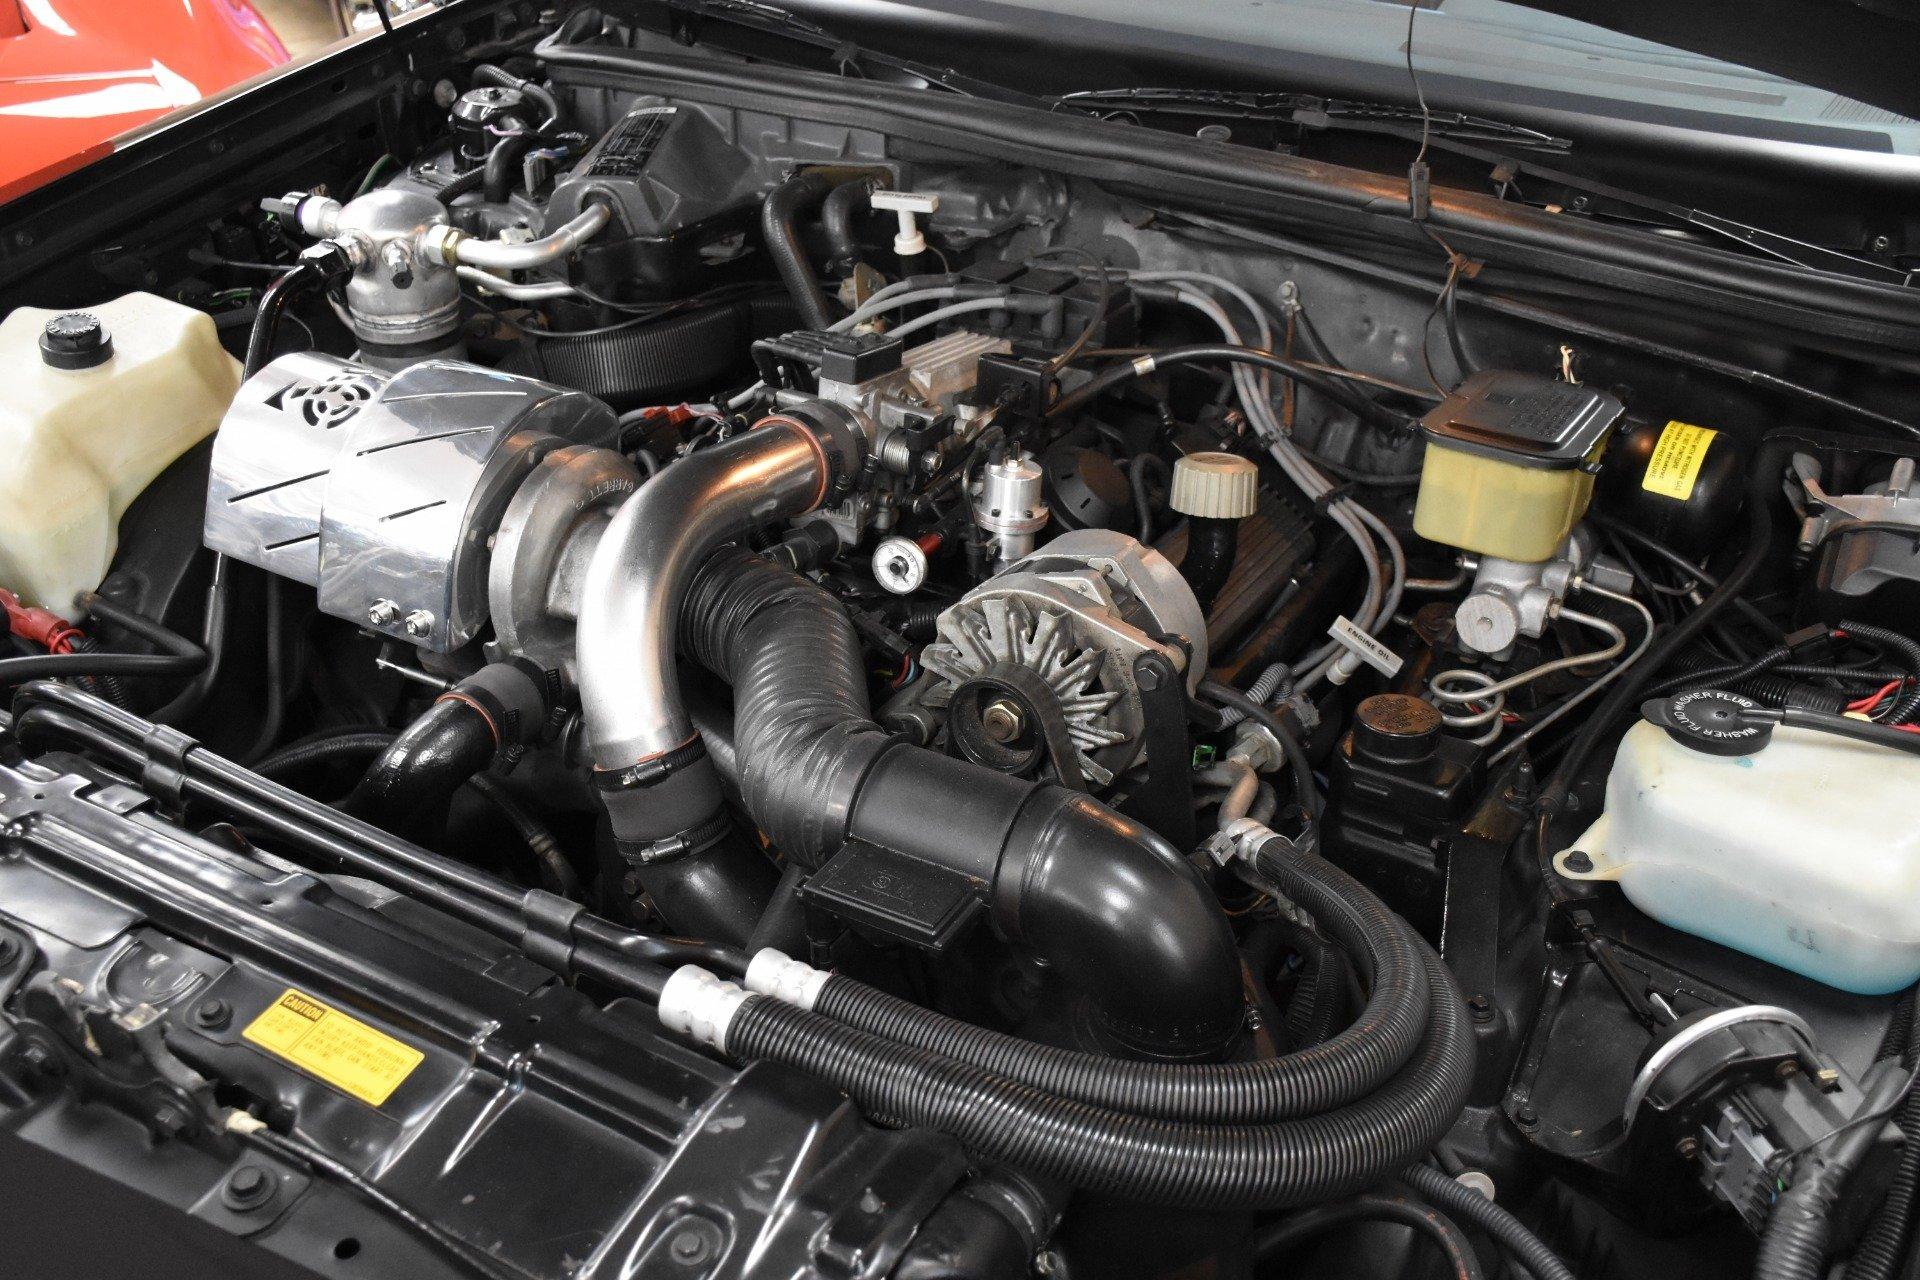 1987 Buick Grand National | Ideal Classic Cars LLC